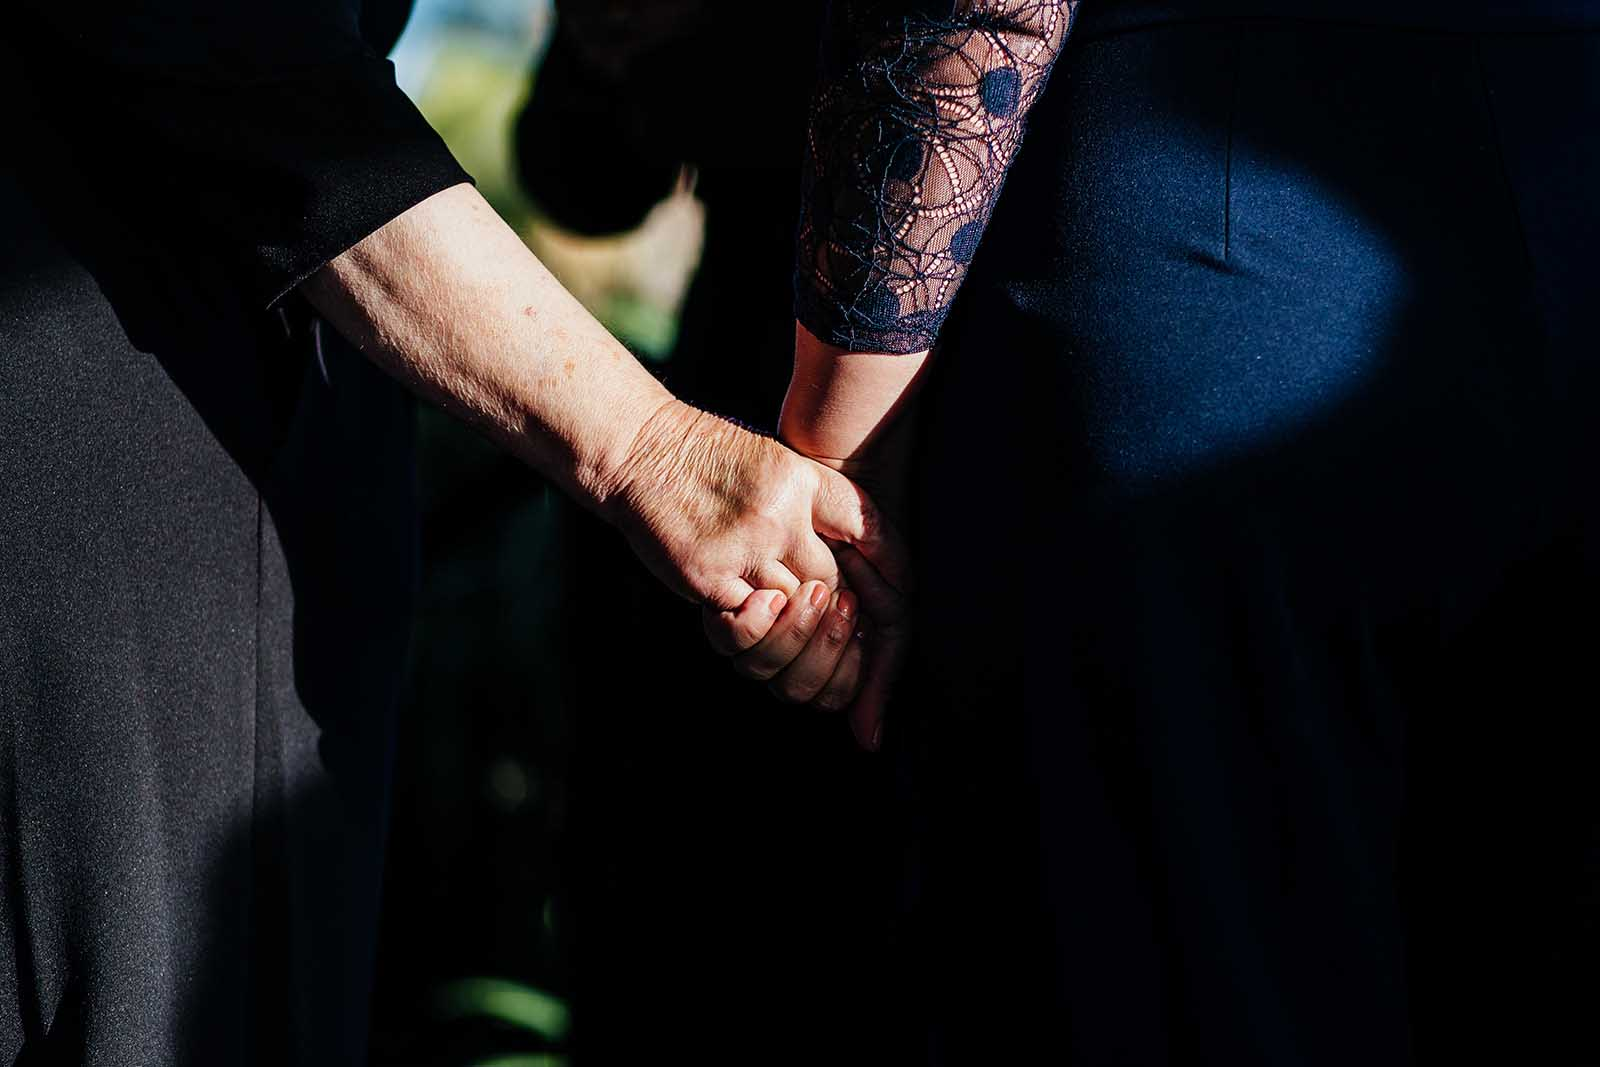 Erin Marton Photography Laguna Beach California America lesbian wedding Dancing With Her directory magazine